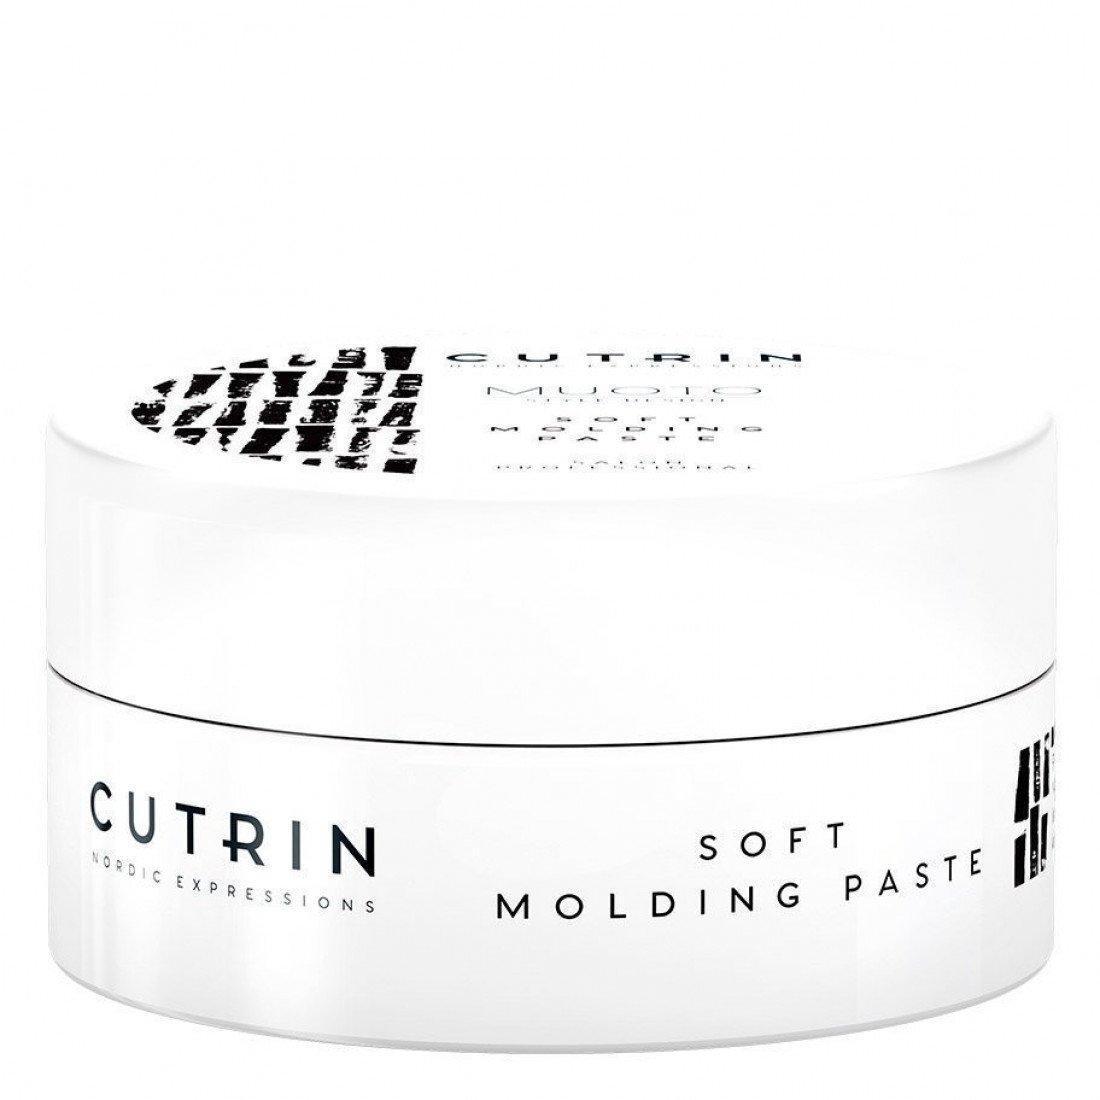 Cutrin soft molding paste Текстурирующая паста, 100 мл